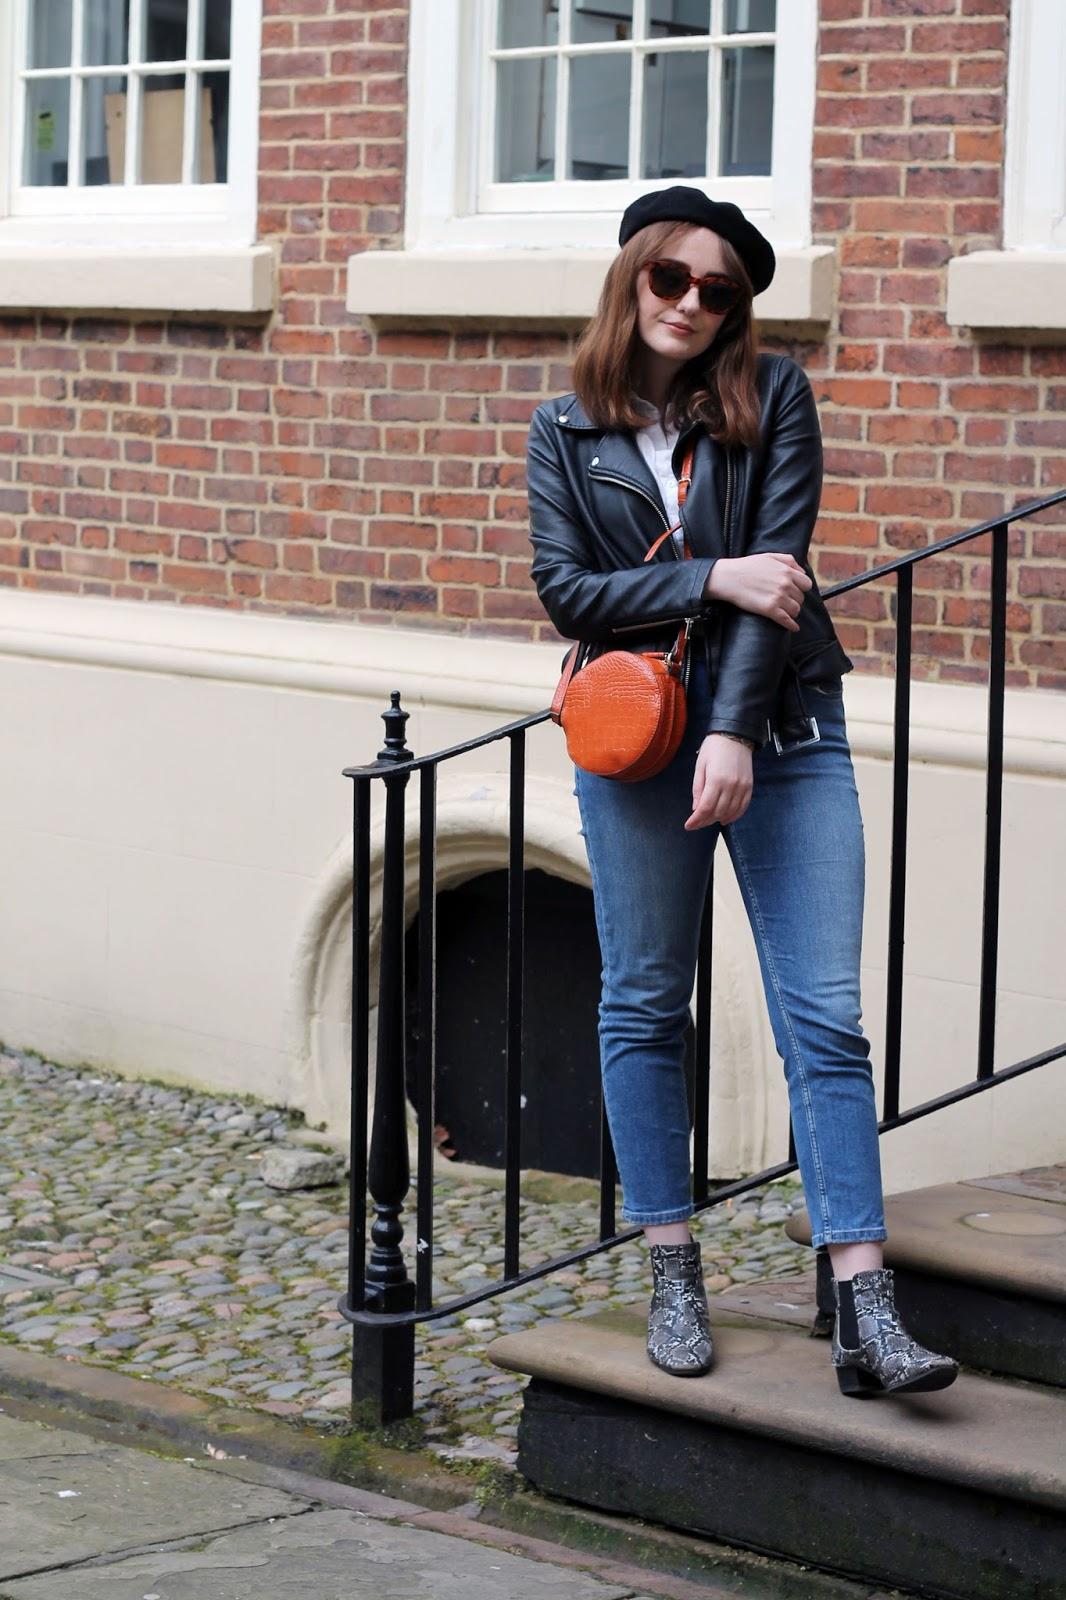 Liverpool fashion blogger outfit with white shirt, blue jeans, snake print boots, black beret, tortoiseshell sunglasses, orange circle bag